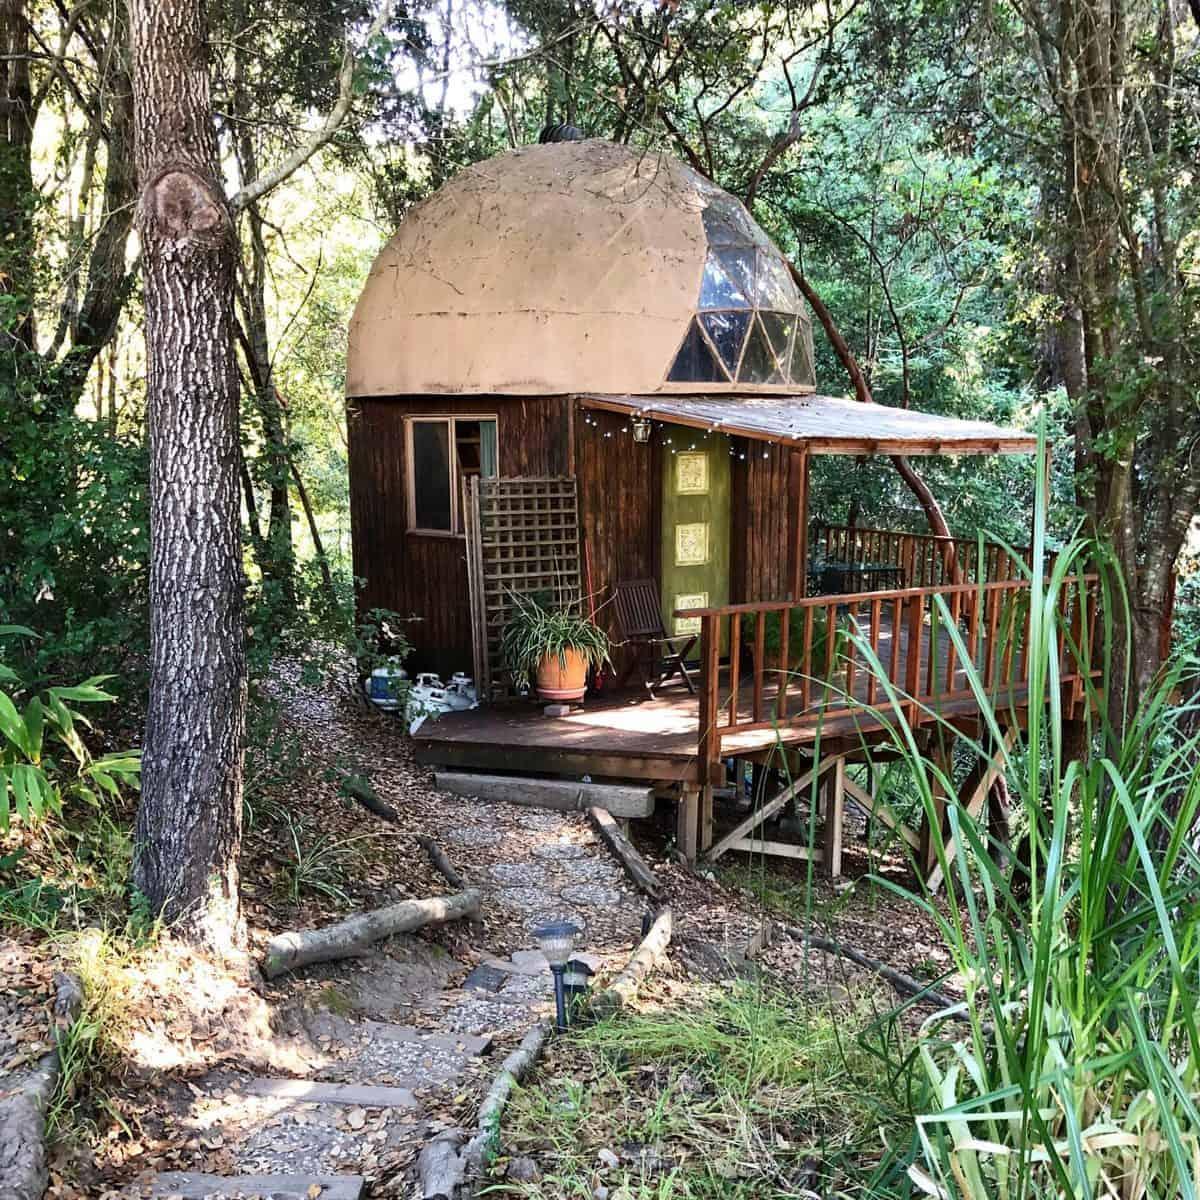 Babymoon in Aptos California at the Mushroom Dome Cabin